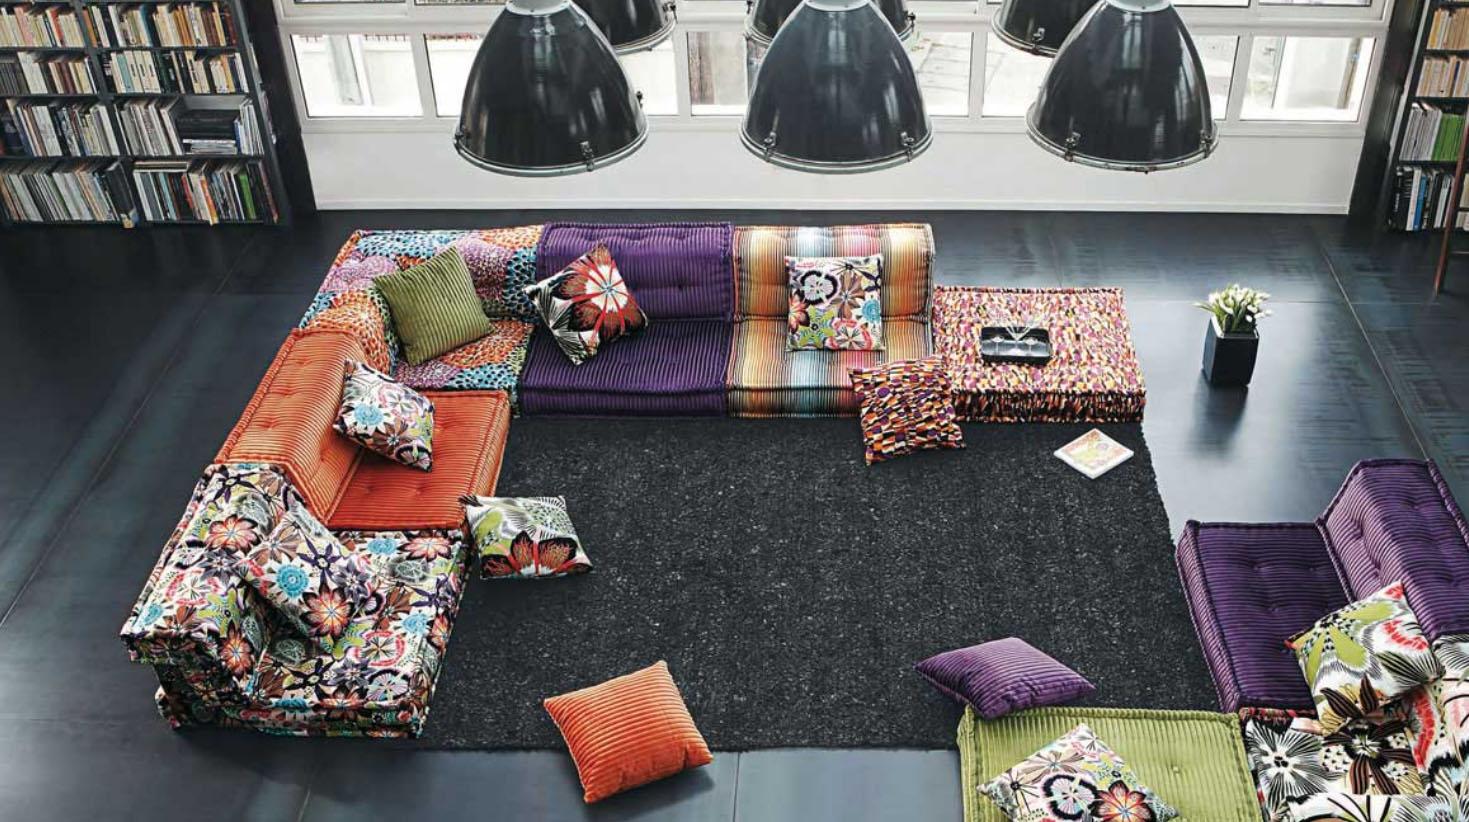 Roche bobois stylish and functional mah jong modular sofas designed